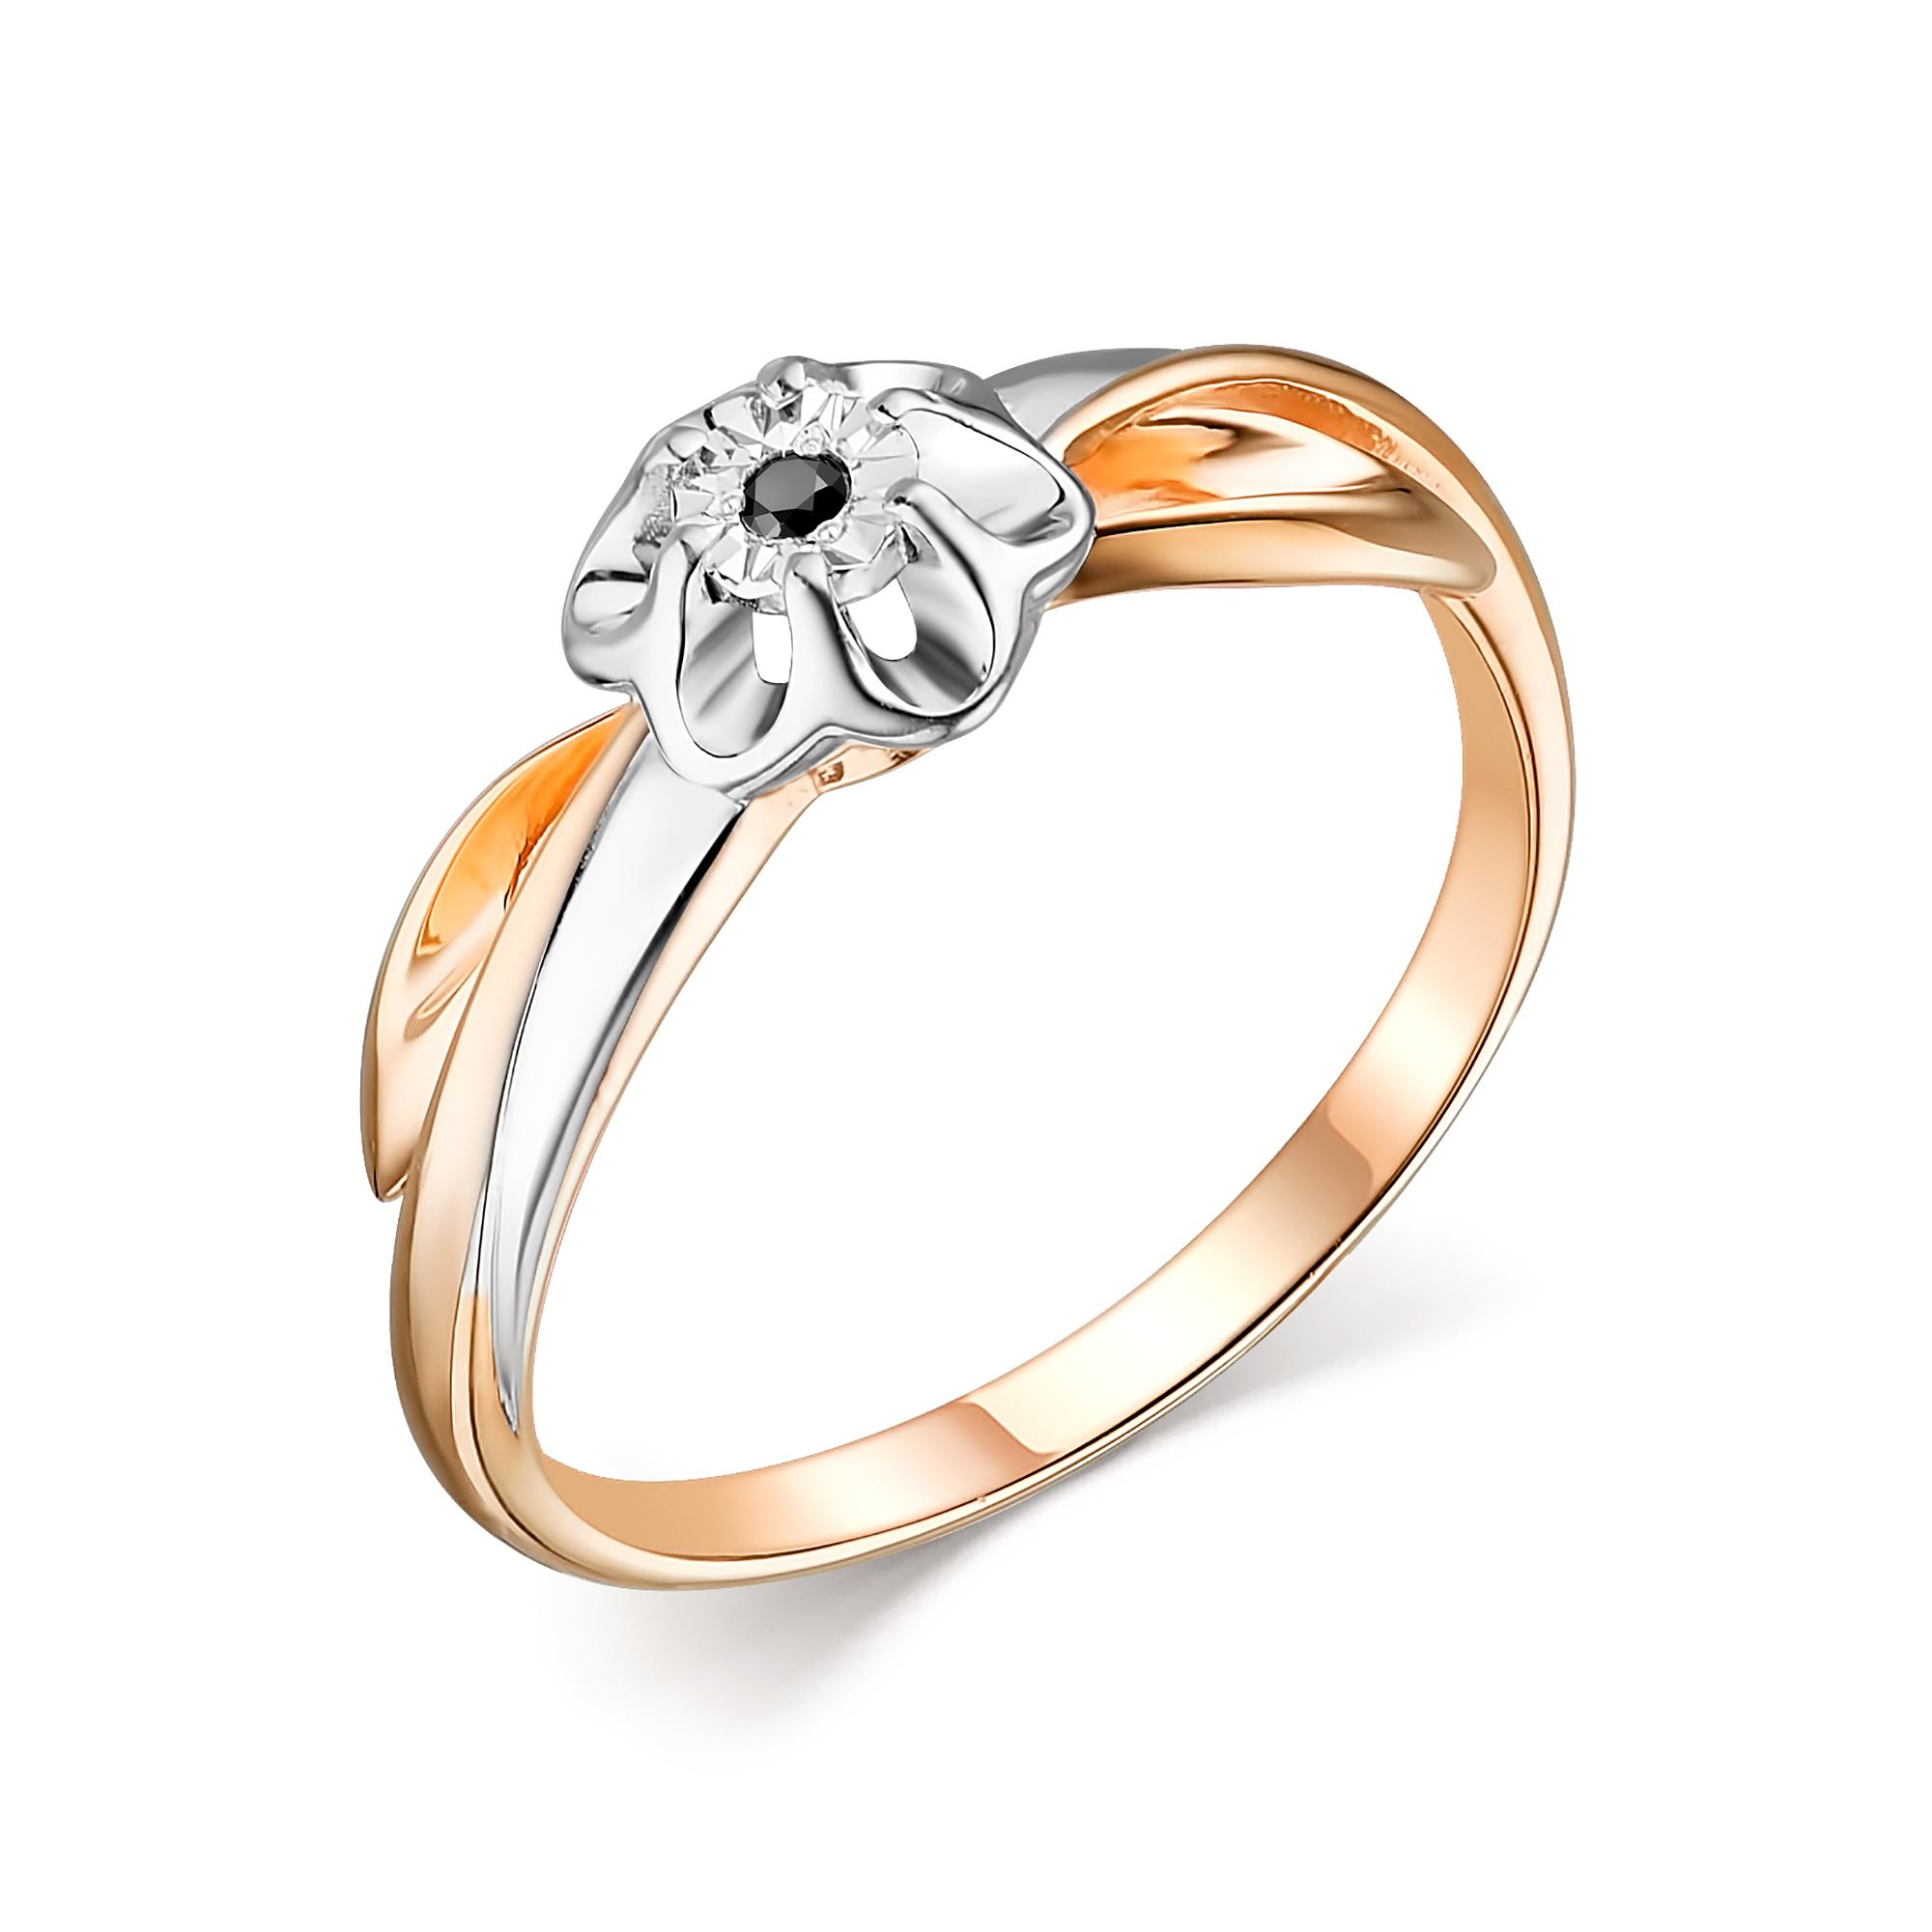 Серебряное кольцо АЛЬКОР с бриллиантом 01-1613/00ЧБ-06